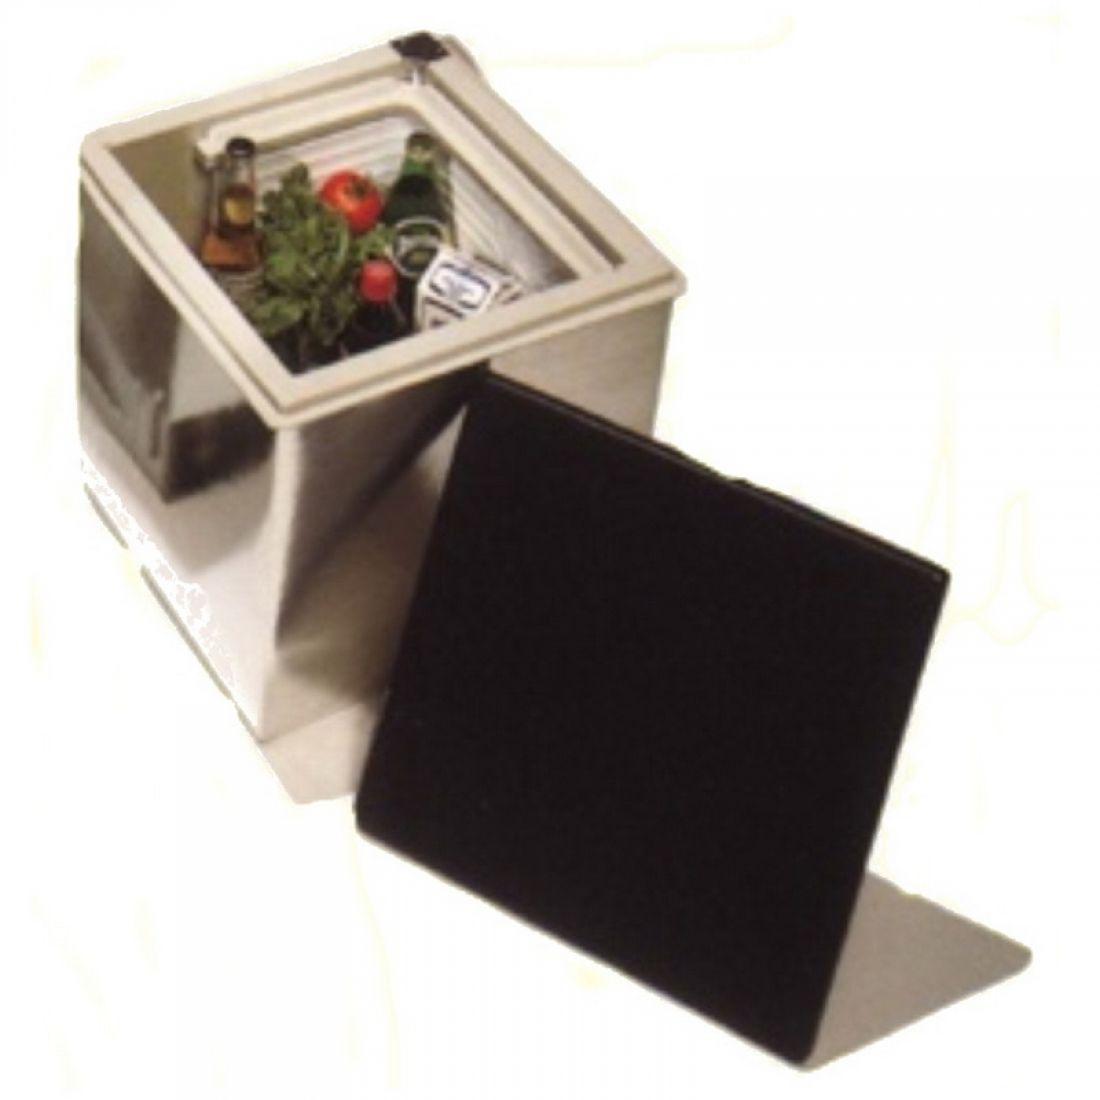 kb 40 ipen kissmann einbauk hlbox f r 12volt 24volt. Black Bedroom Furniture Sets. Home Design Ideas